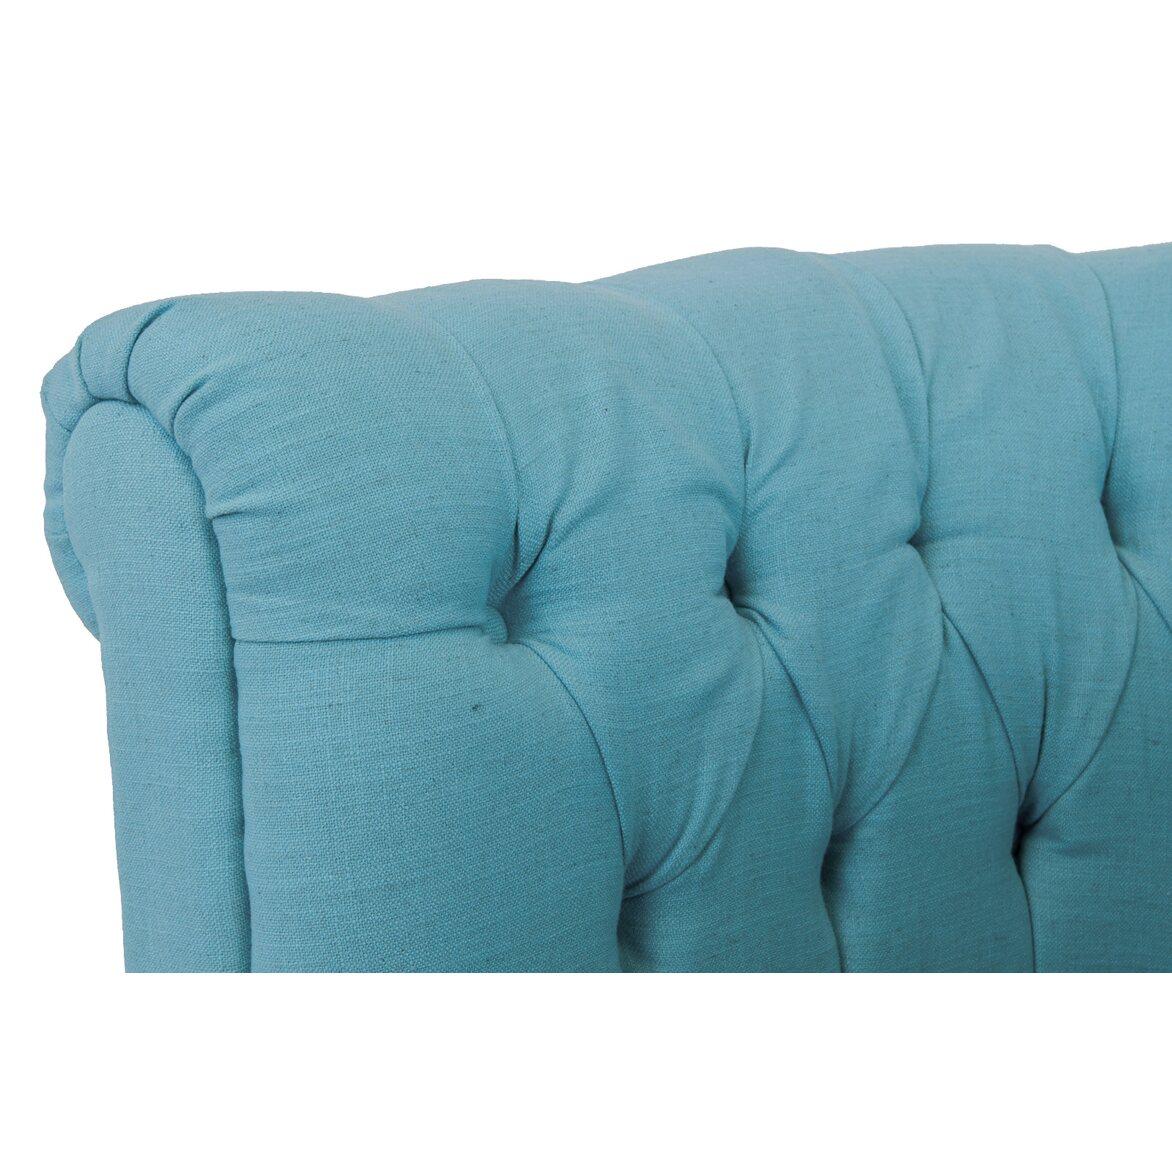 Кресло Swaun turquoise 5 | Каминные кресла Kingsby